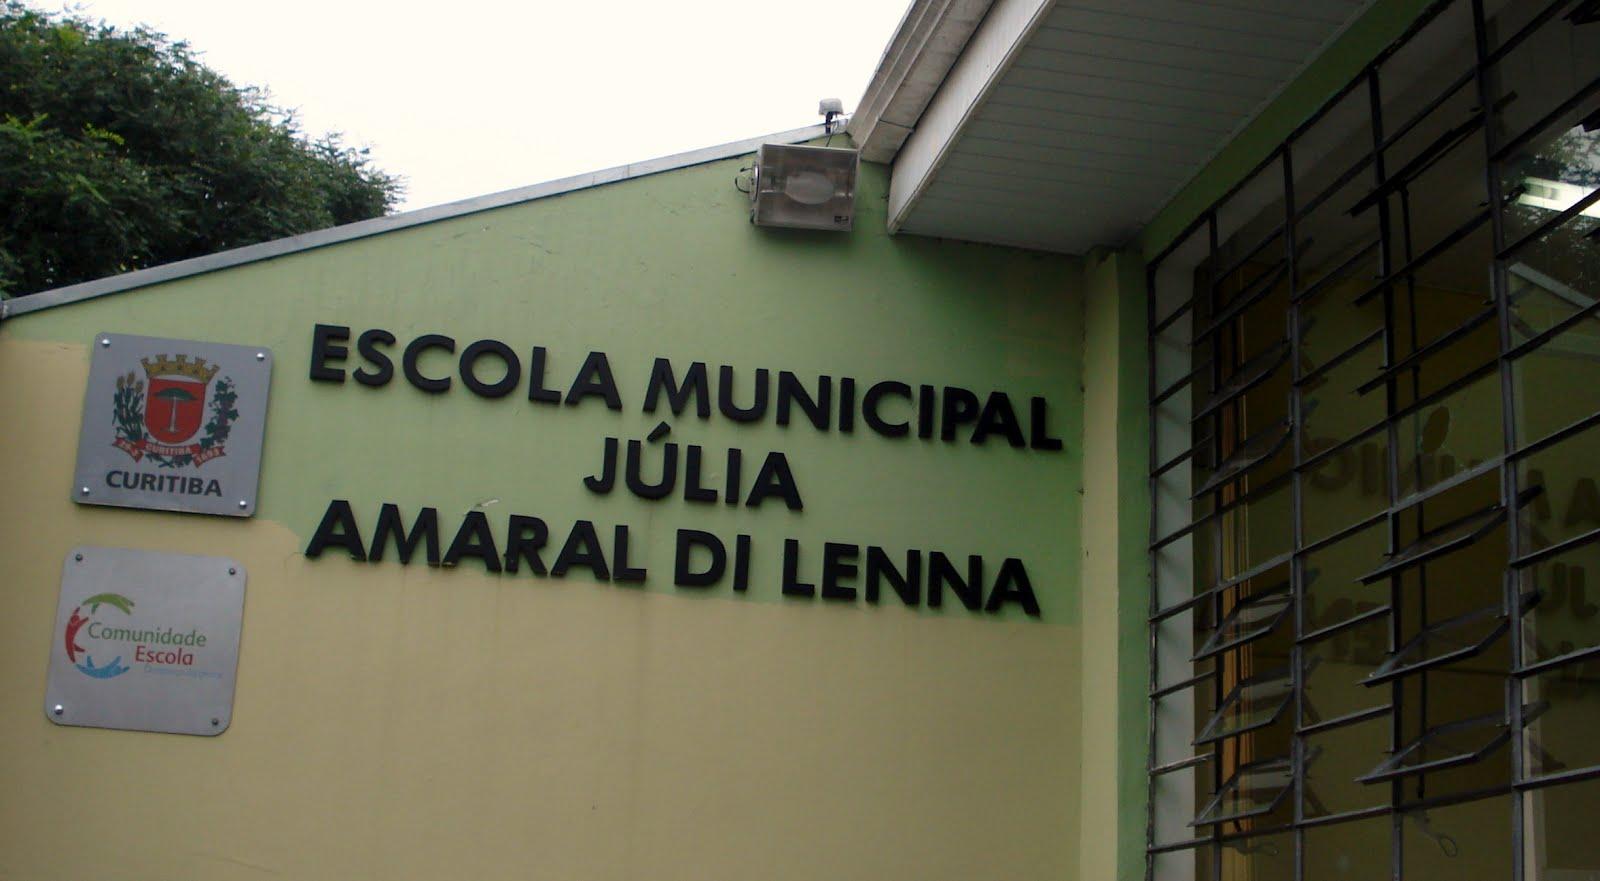 ESCOLA MUNICIPAL JULIA AMARAL DI LENNA